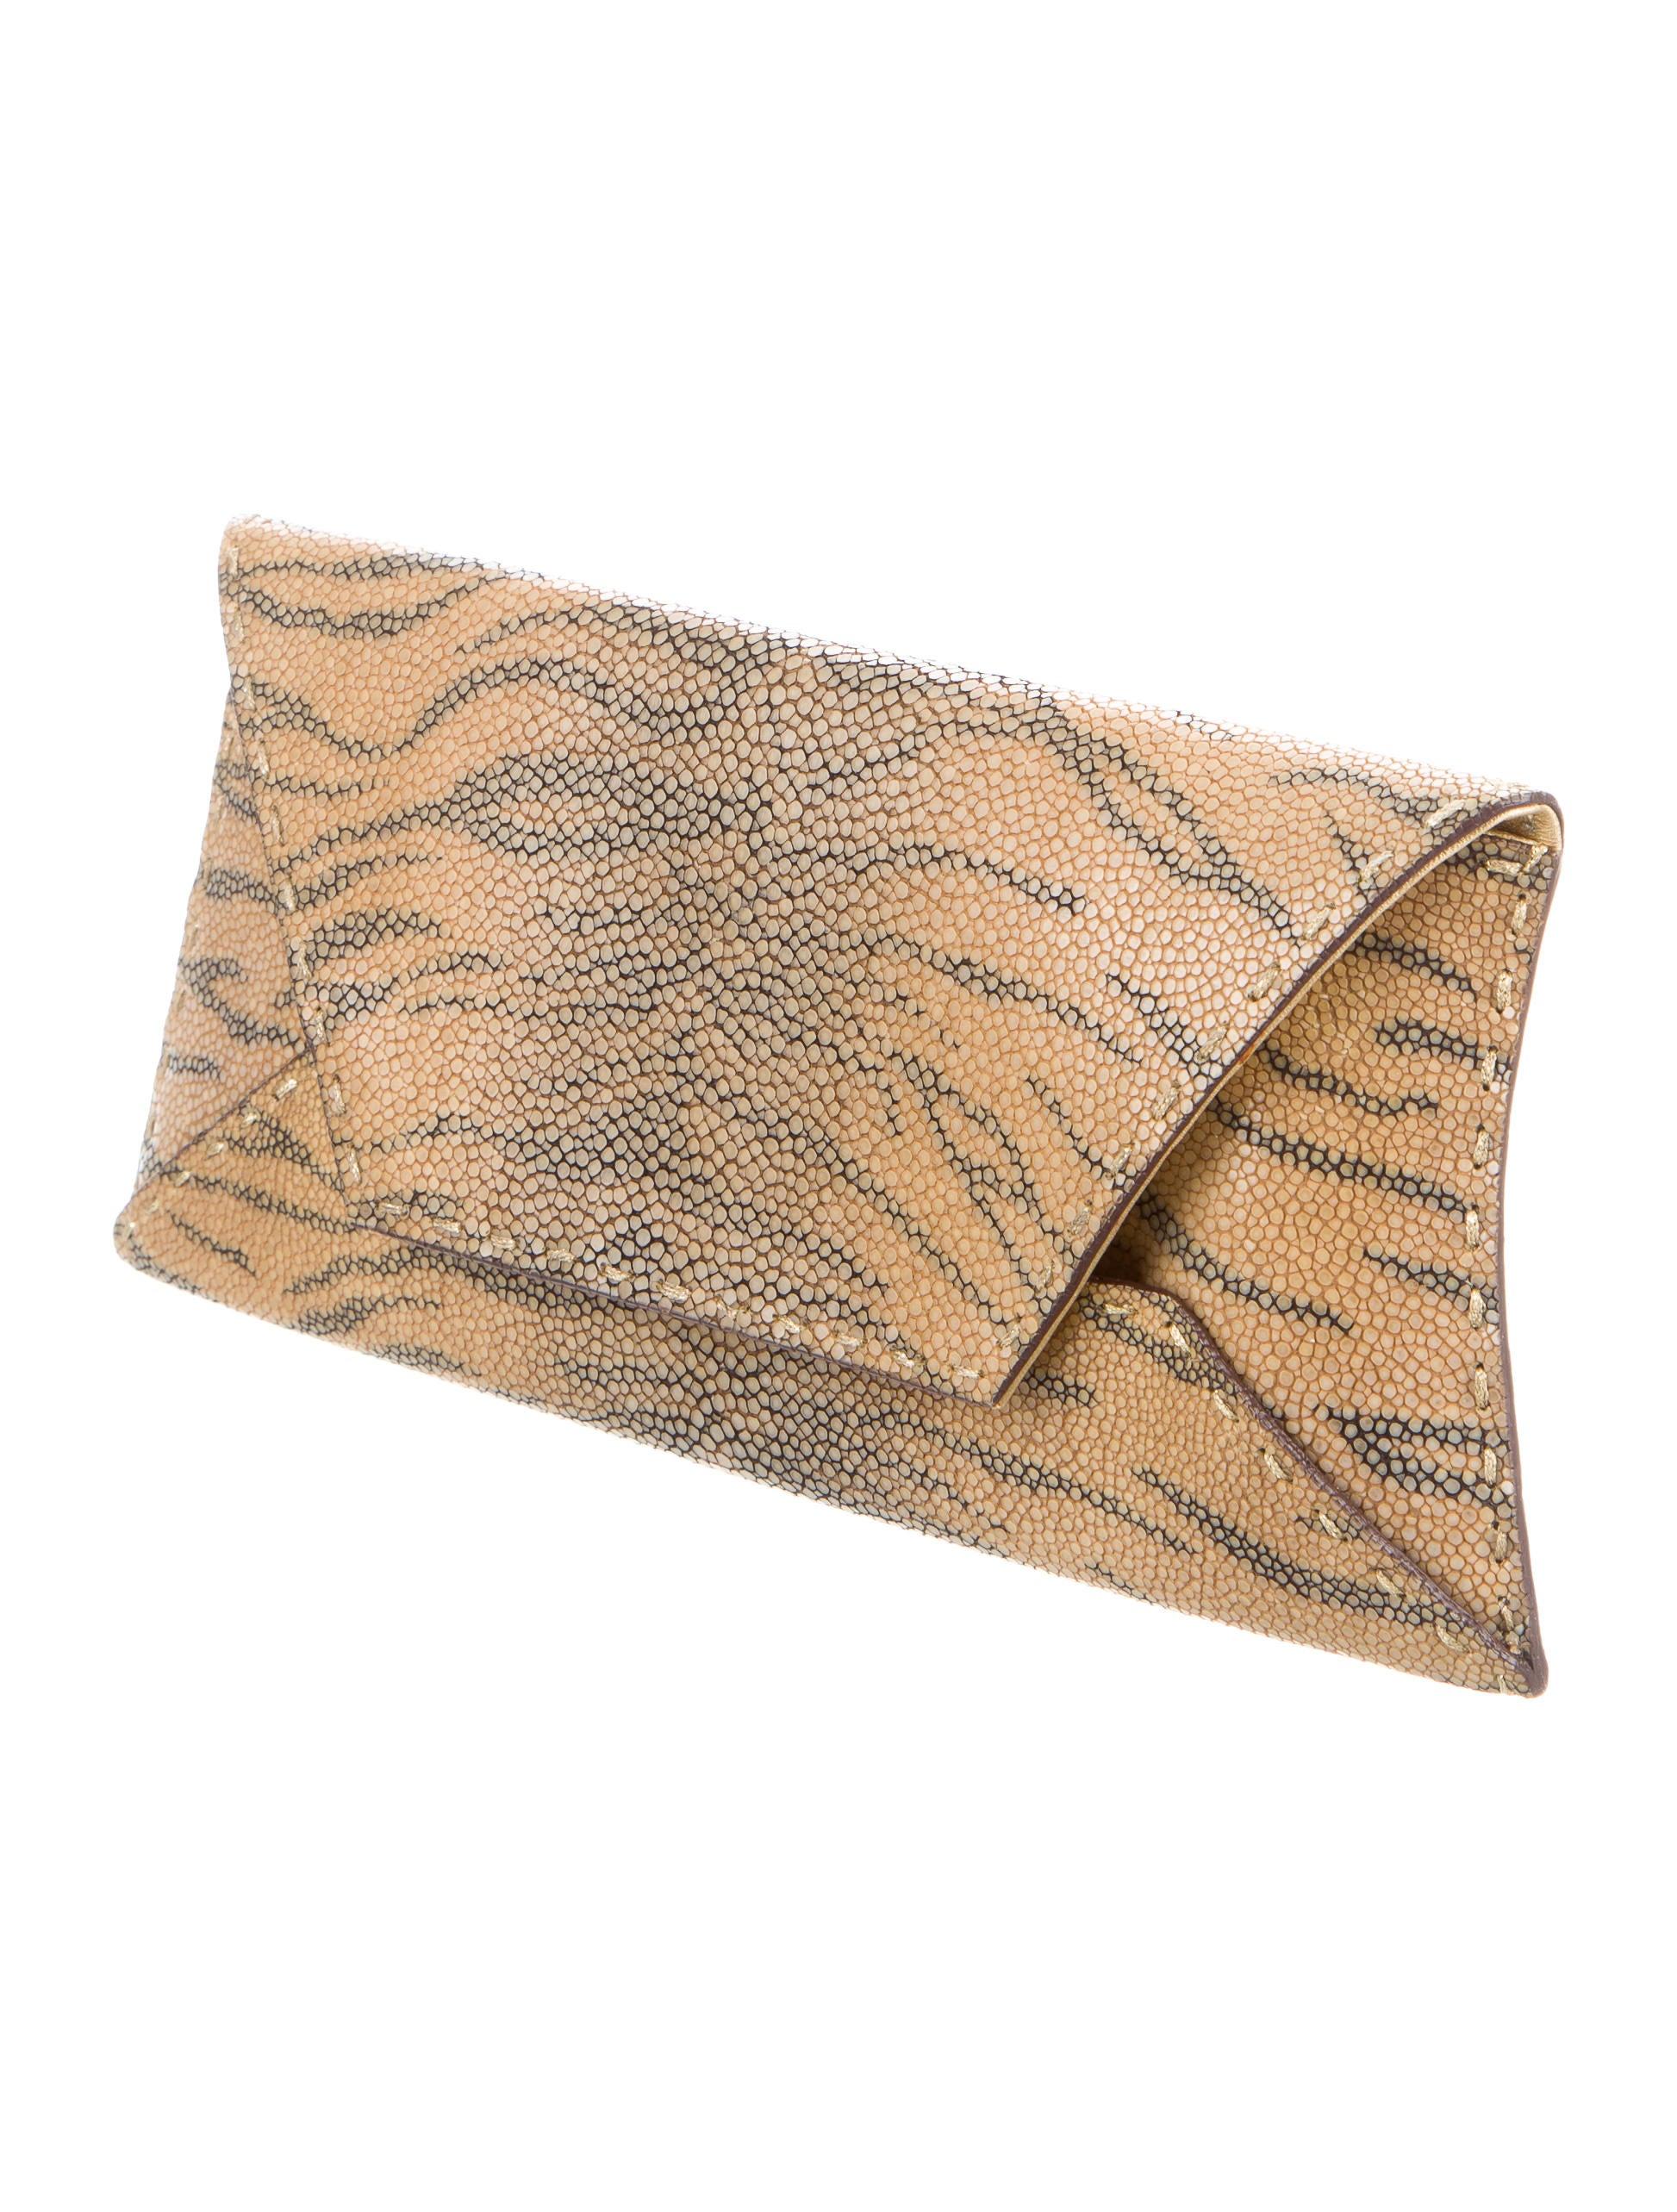 Vbh Stingray Manila Clutch Handbags Vbh20741 The Realreal